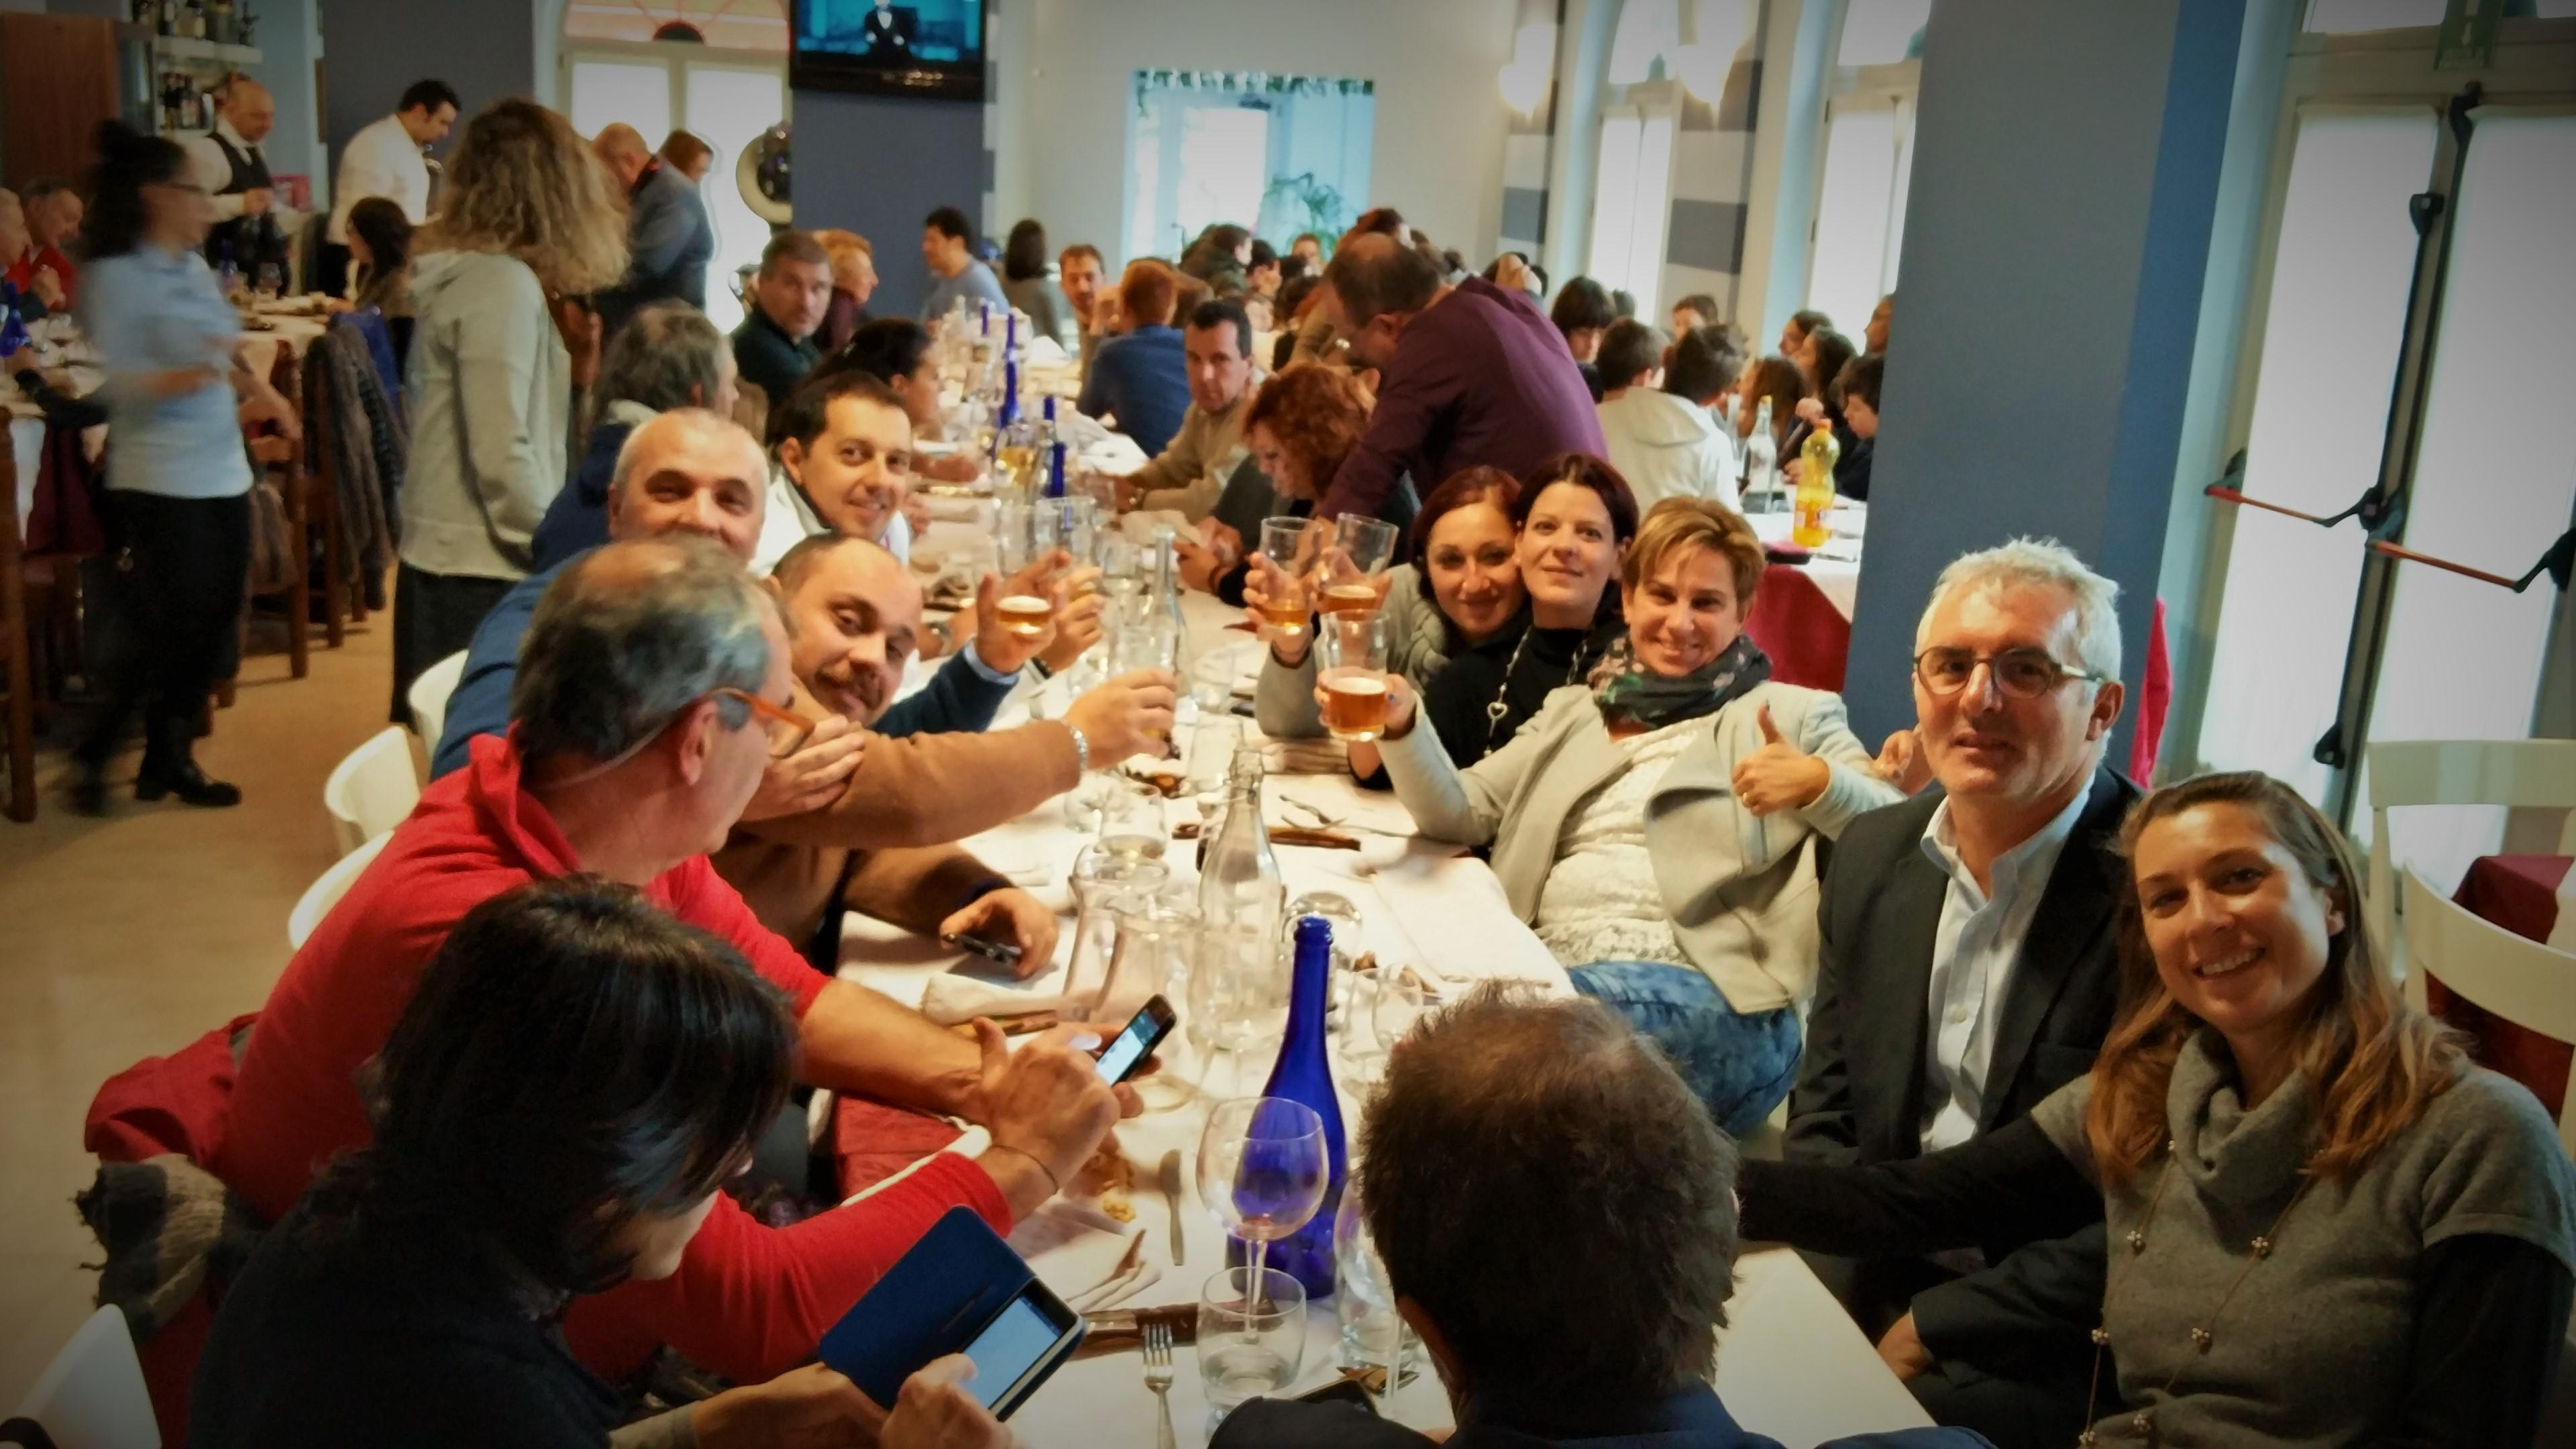 pranzo natale 2015 (17)